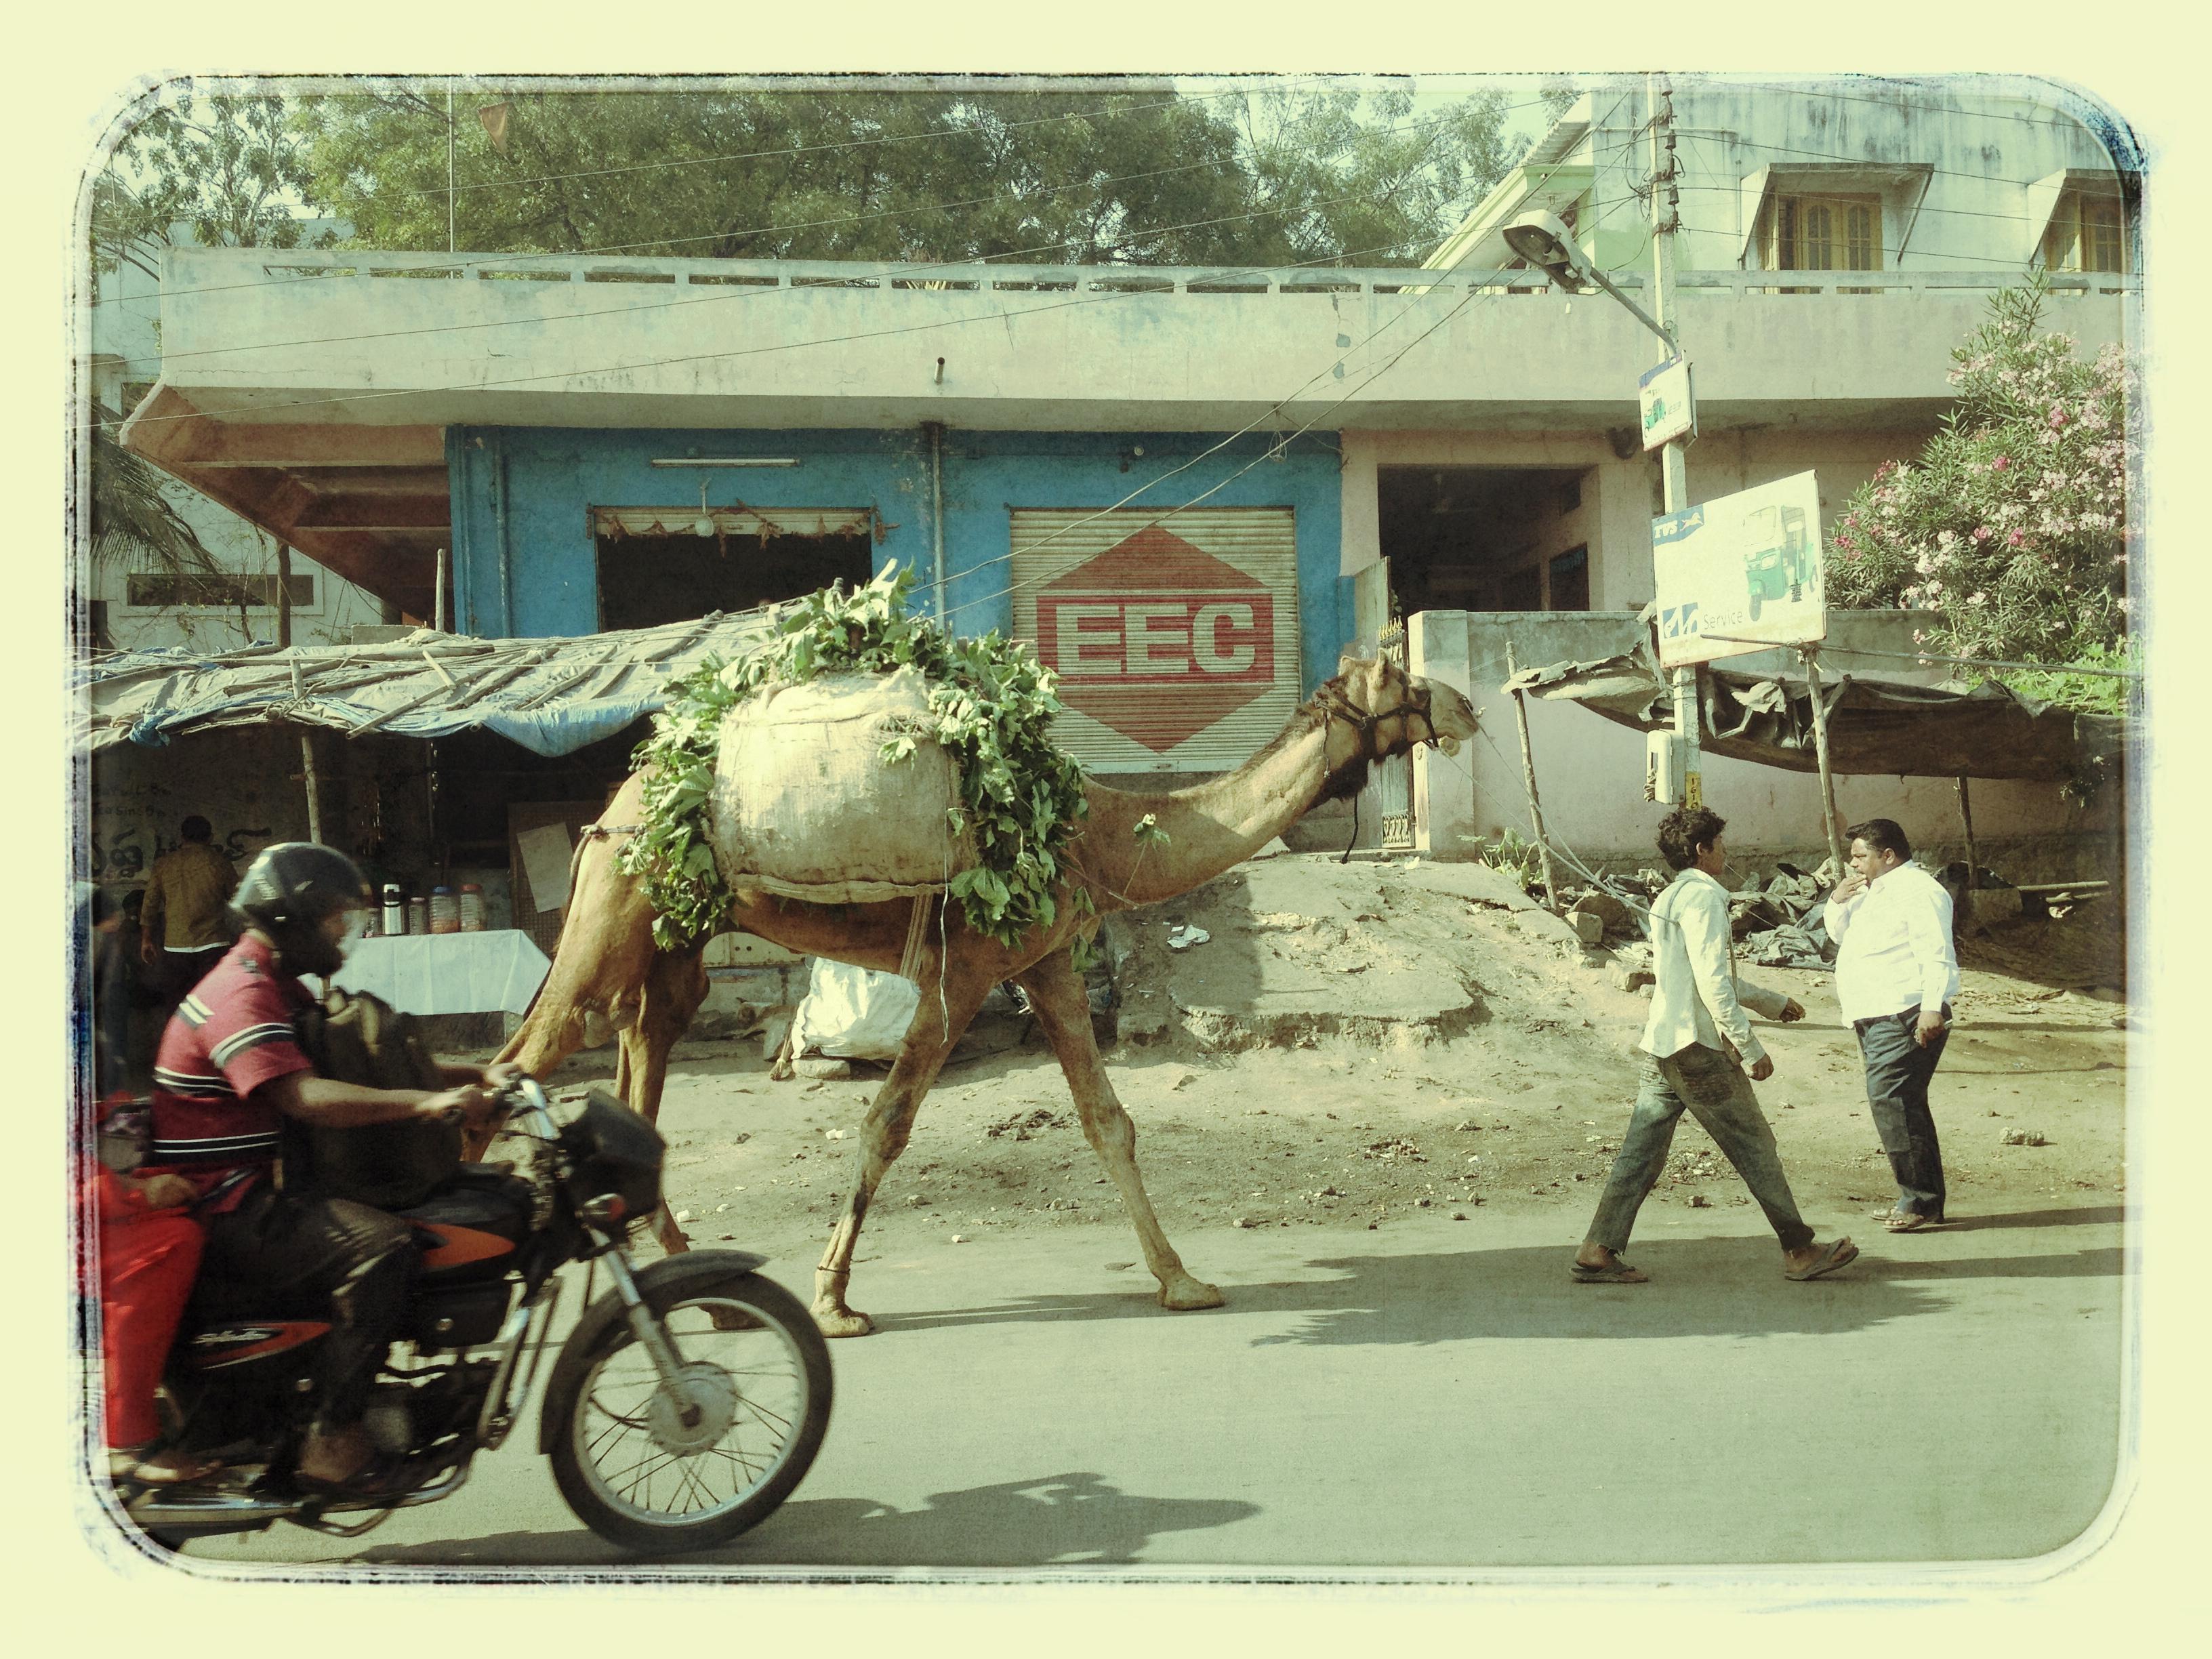 patna | india | 2013